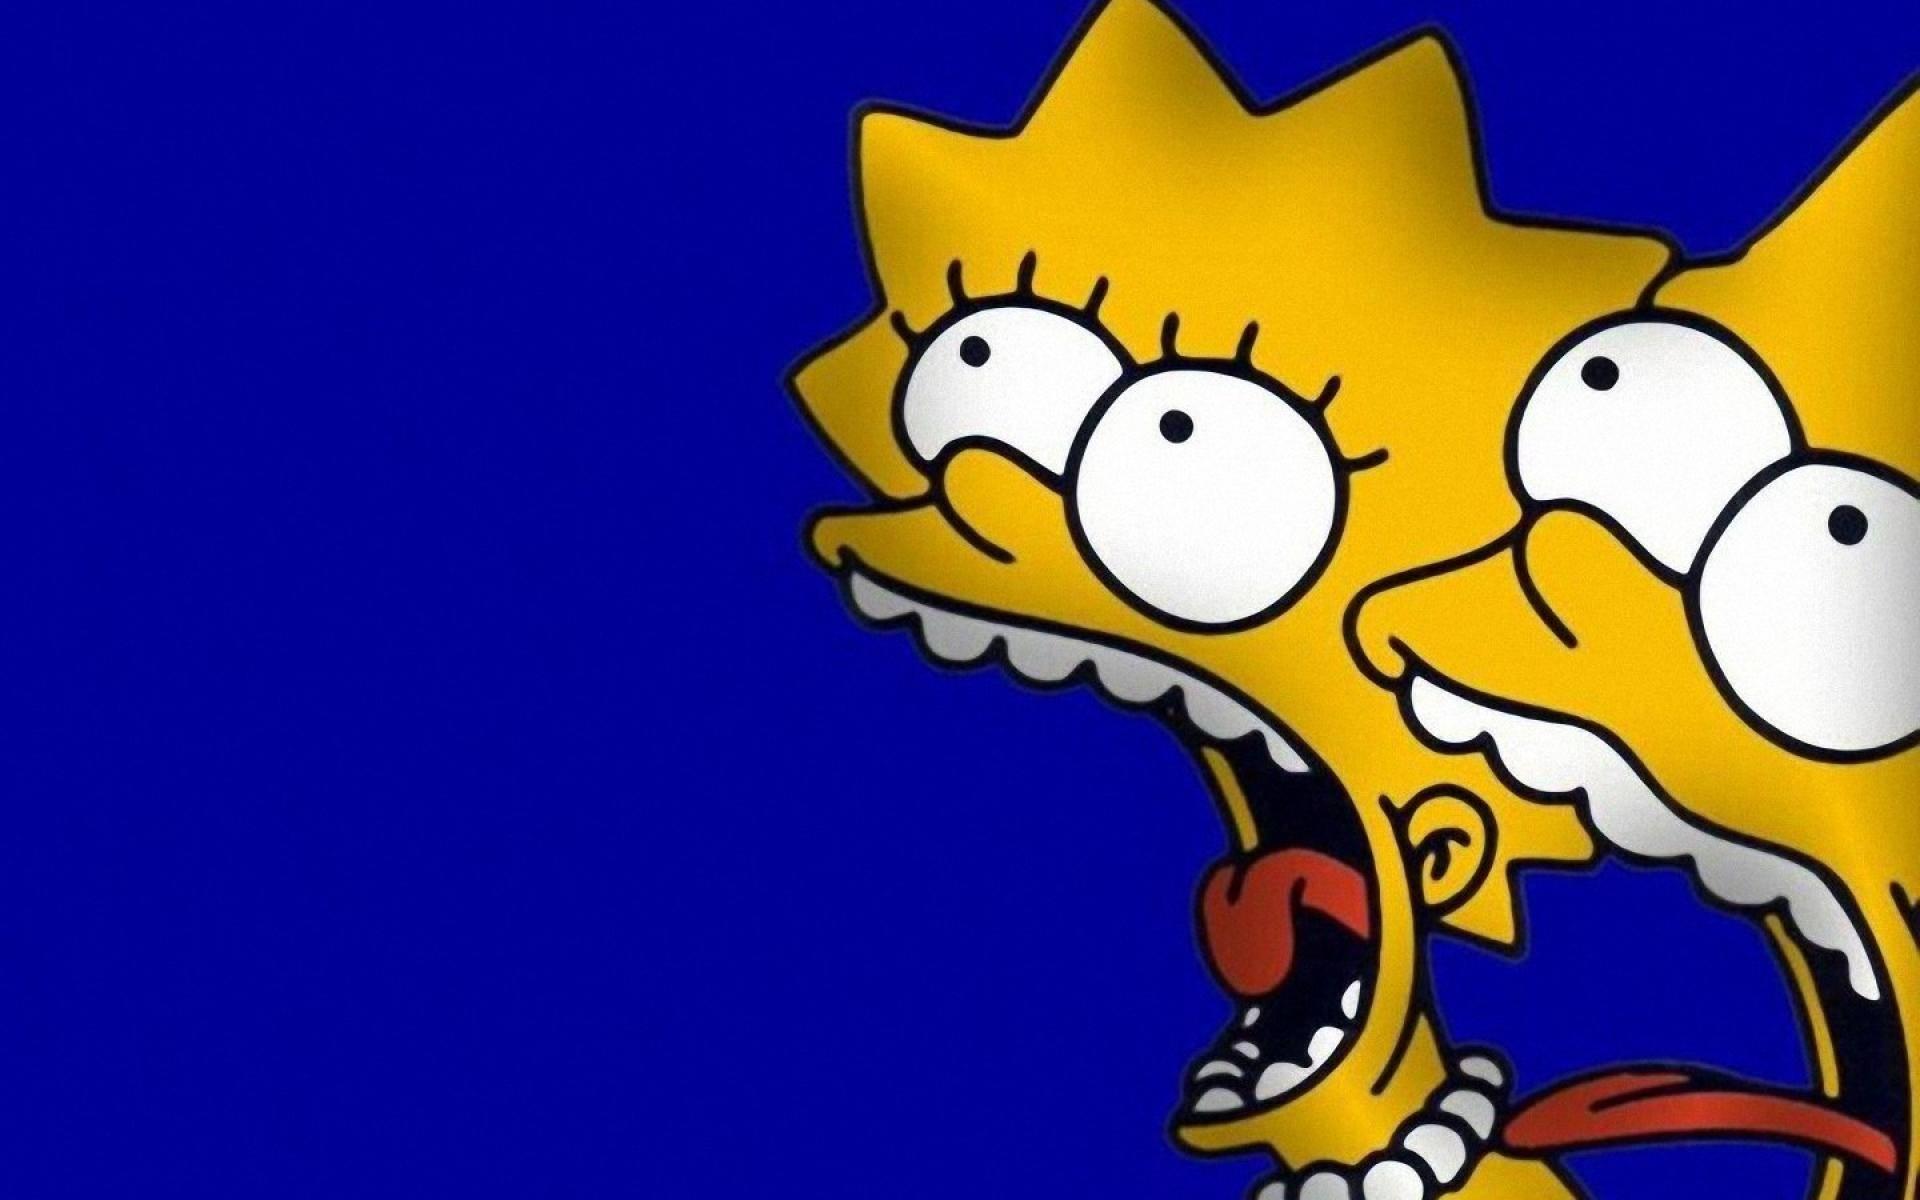 Lisa and Bart Lisa and Bart freaks out 1920x1200